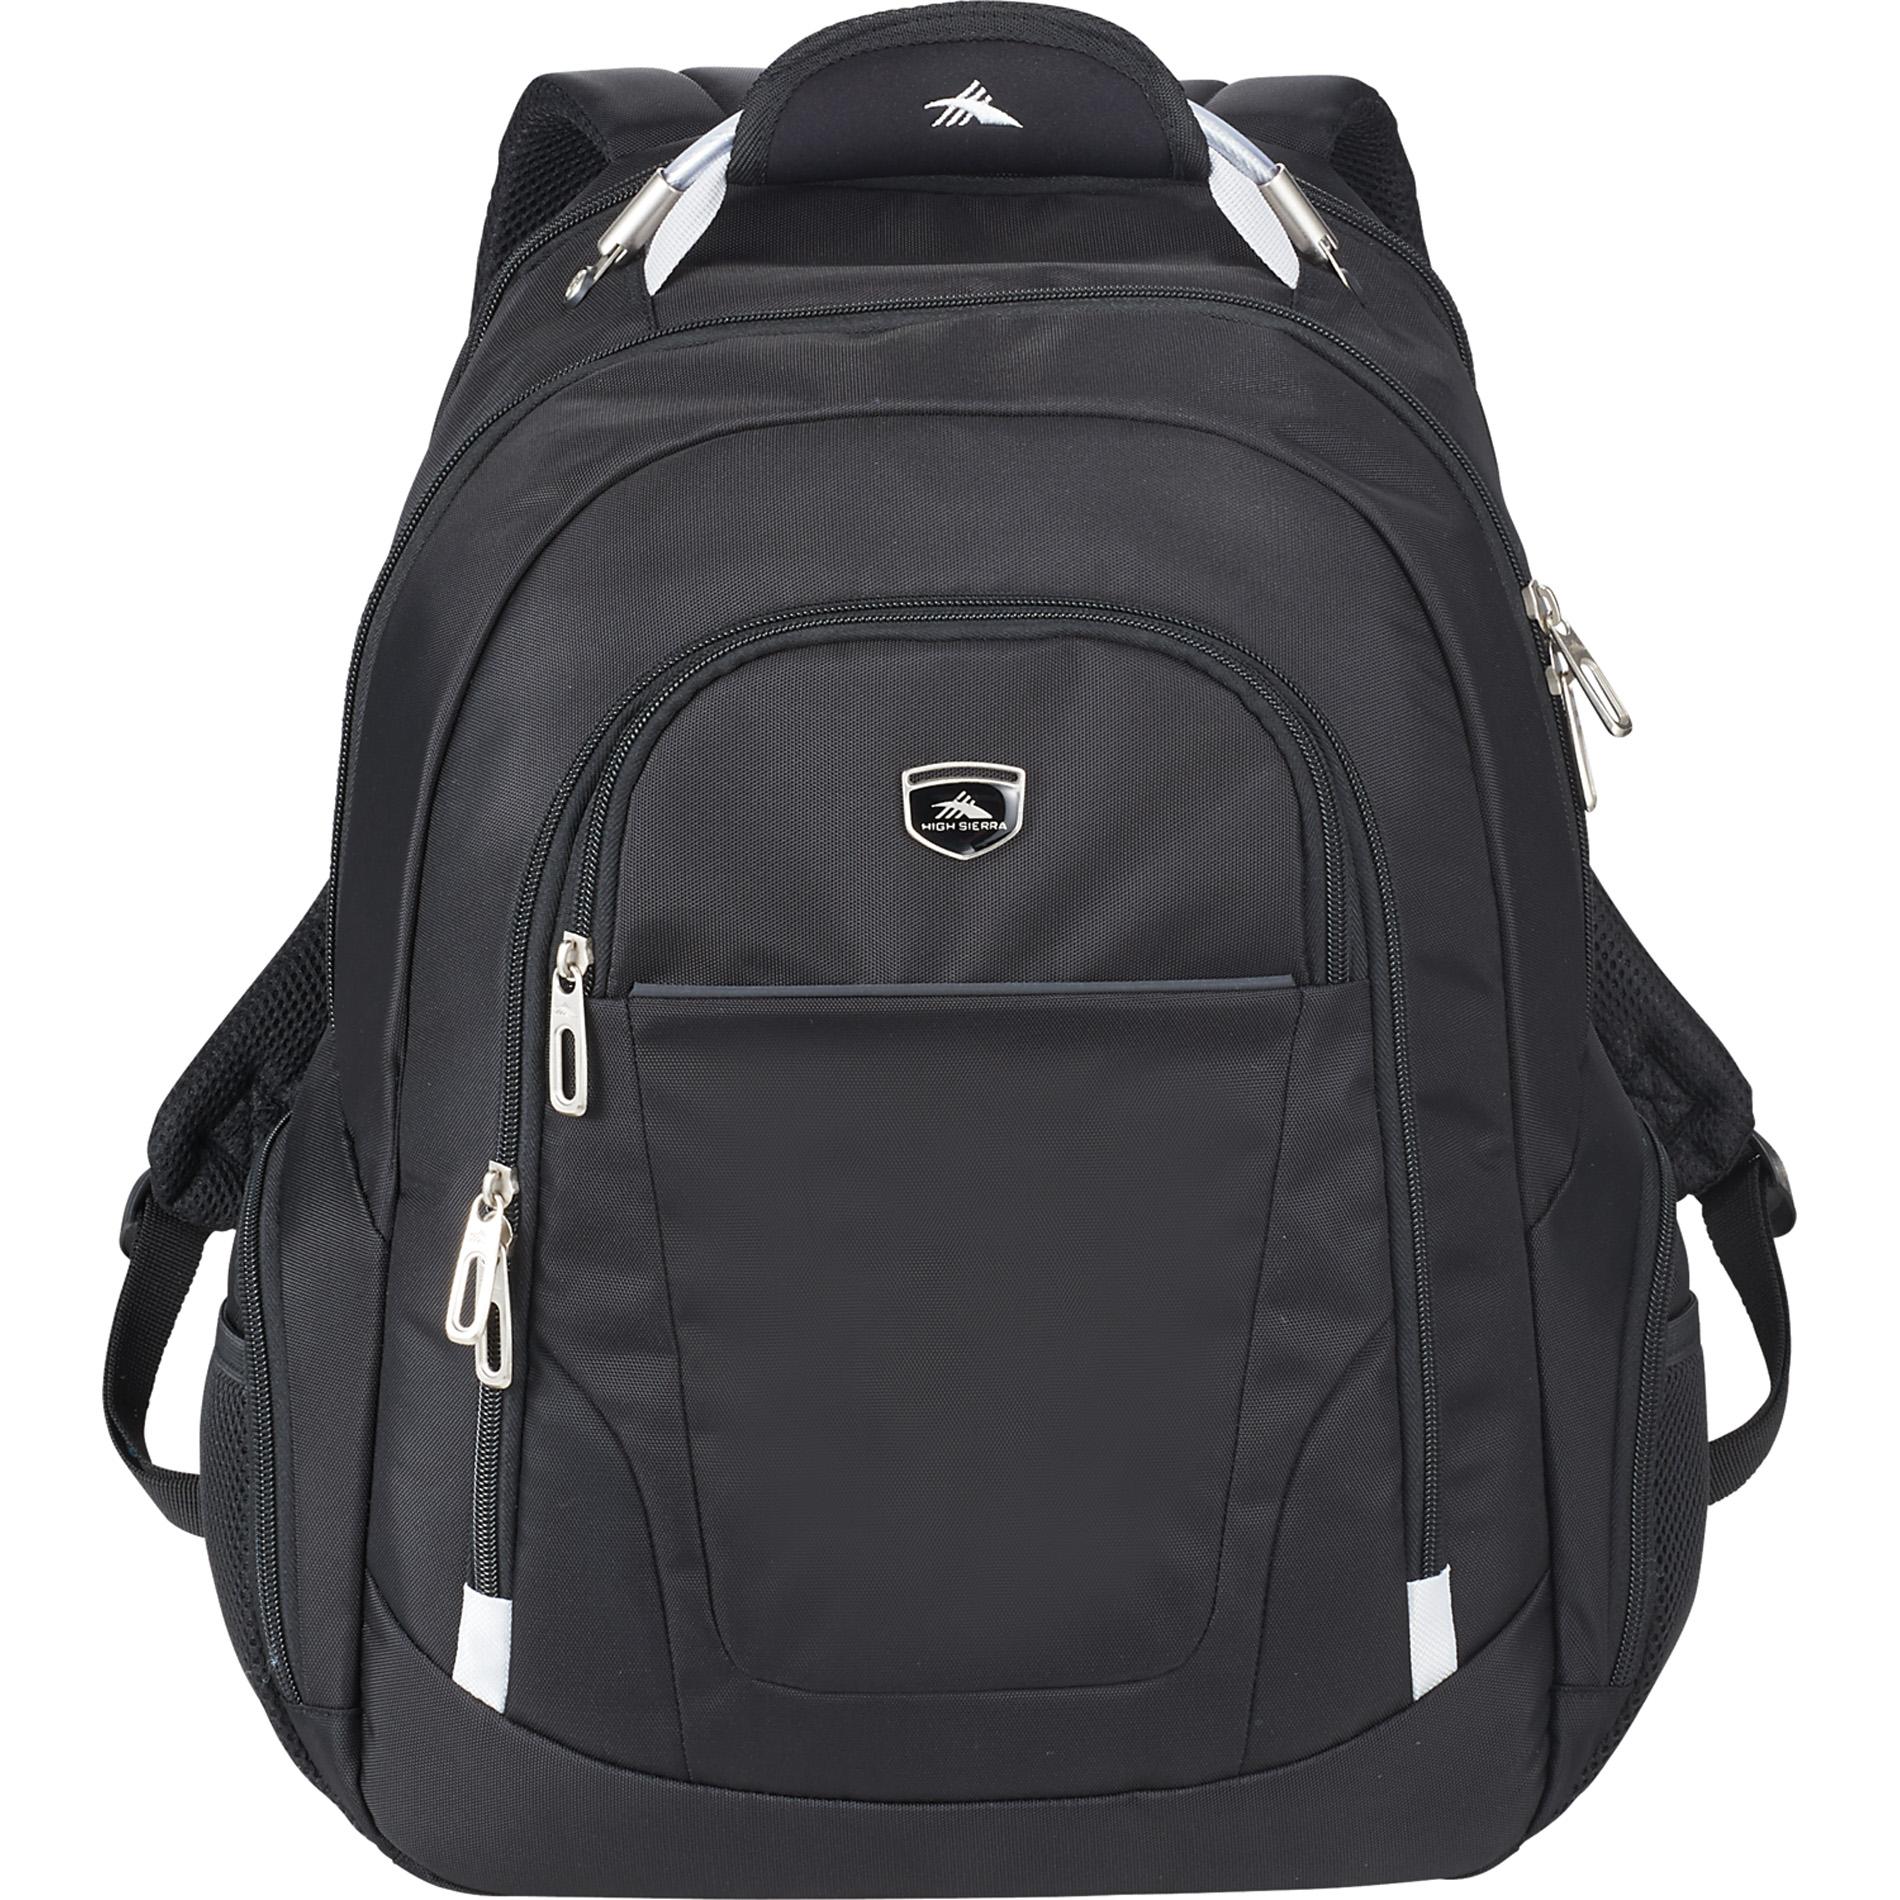 "HIgh Sierra 8052-52 - TSA 15"" Computer Backpack"